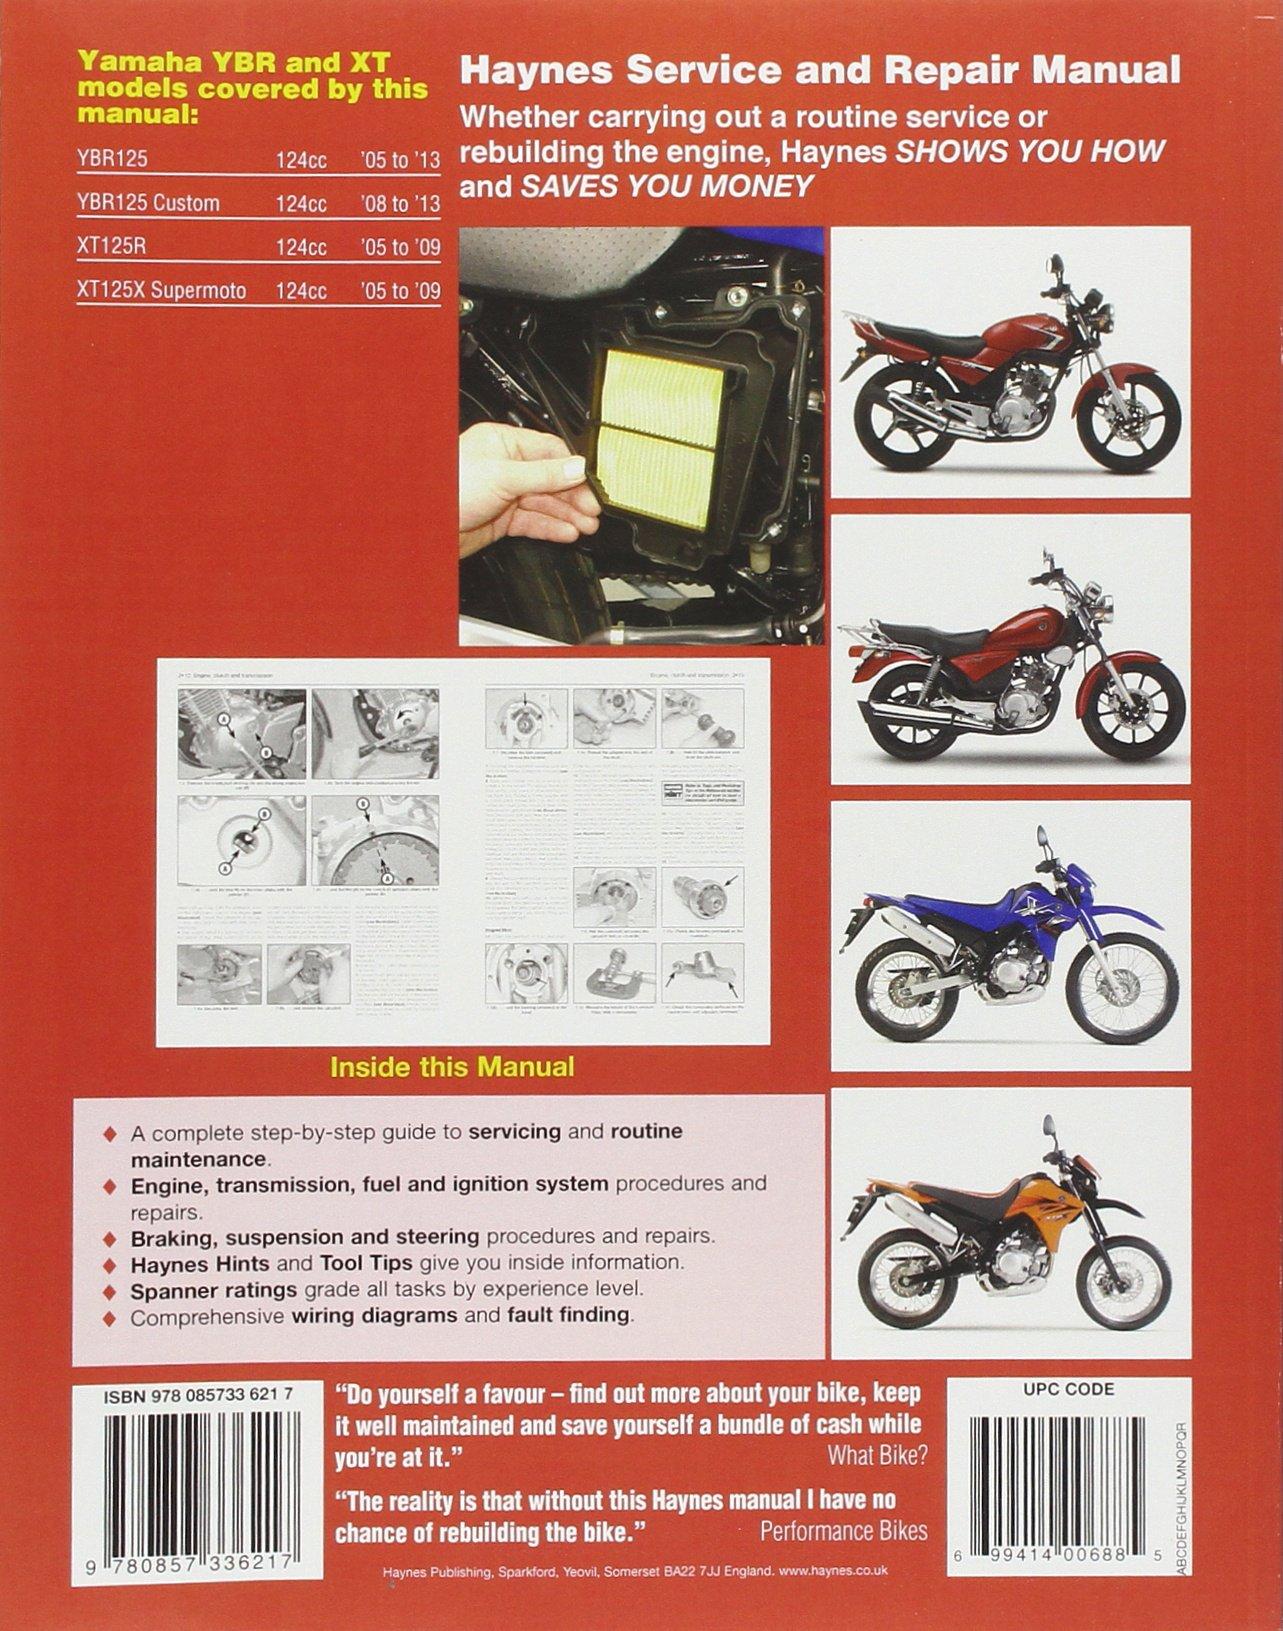 Cococina Motorcycle Engine Gaskets Seals Set For Yamaha Ttr 125 2001 Ttr125 Wiring Diagram 2014